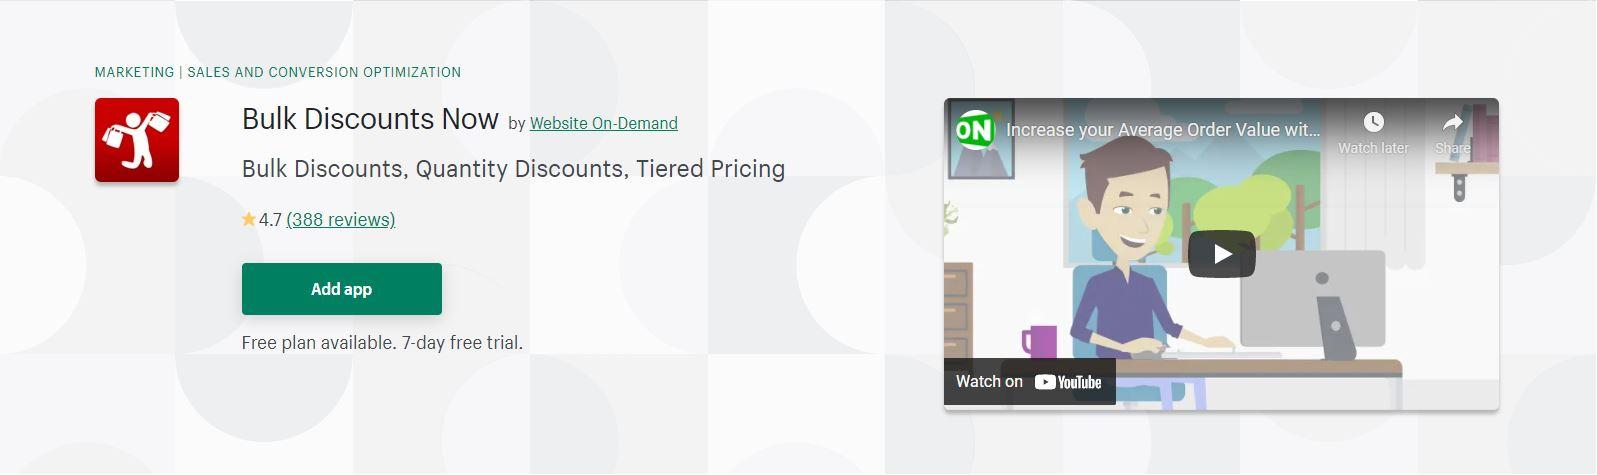 Bulk Discounts Now